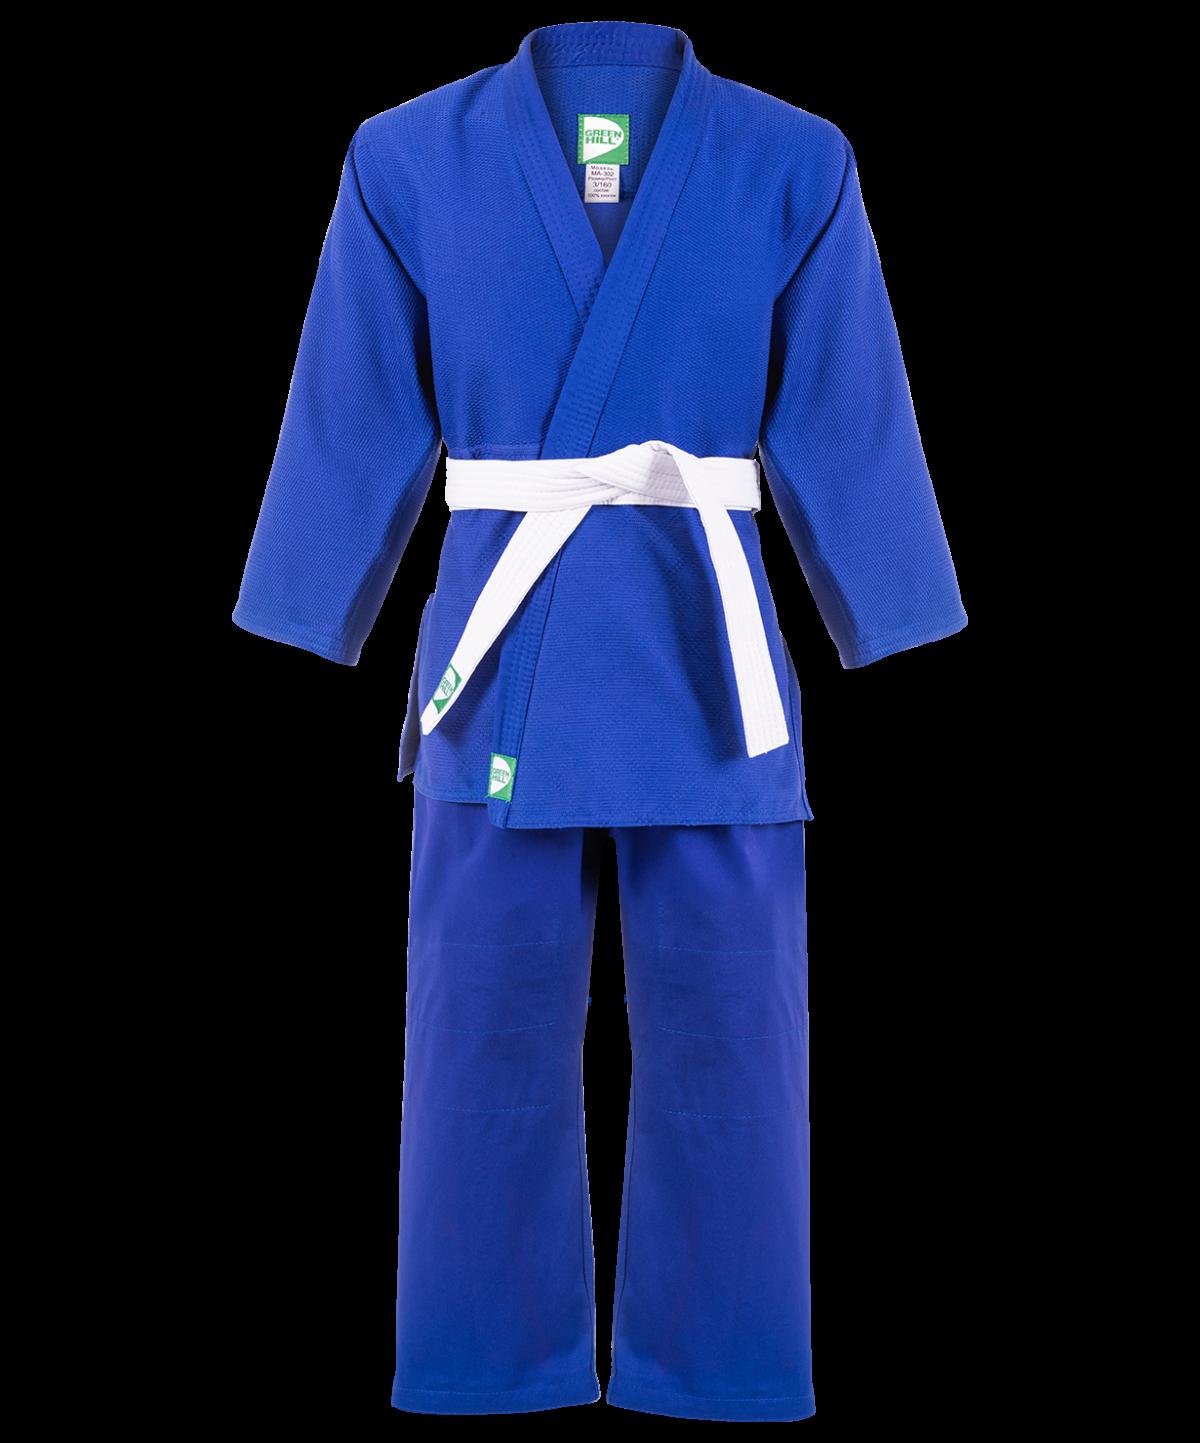 GREEN HILL Кимоно дзюдо 0/130  MA-302: синий - 1